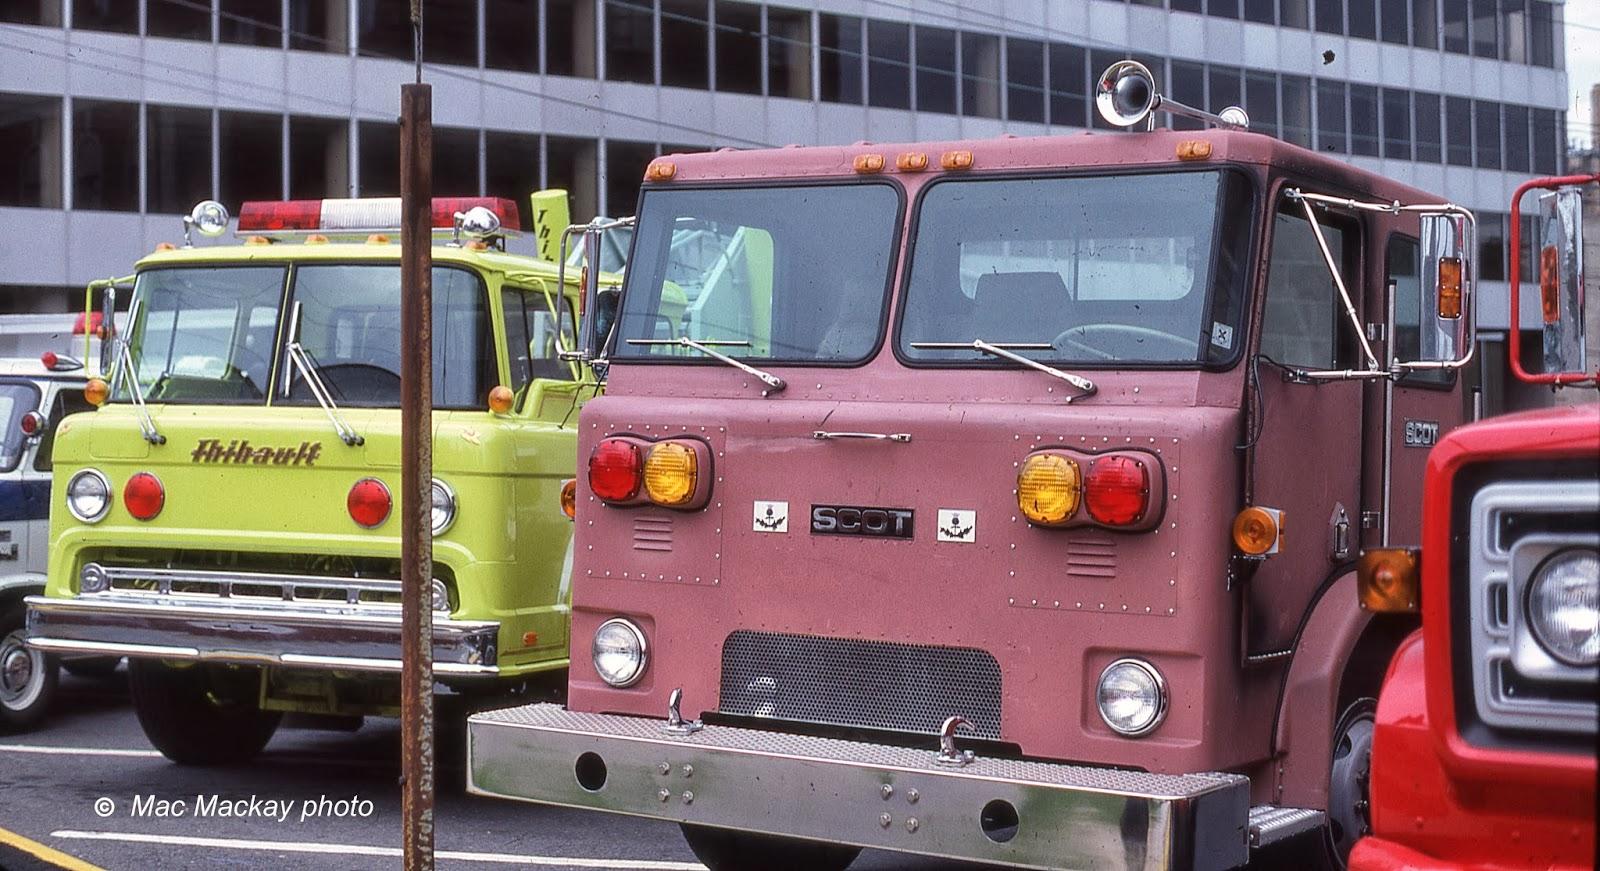 Truckfax: Scot trucks Part 4 of 3 - fire apparatus chassis